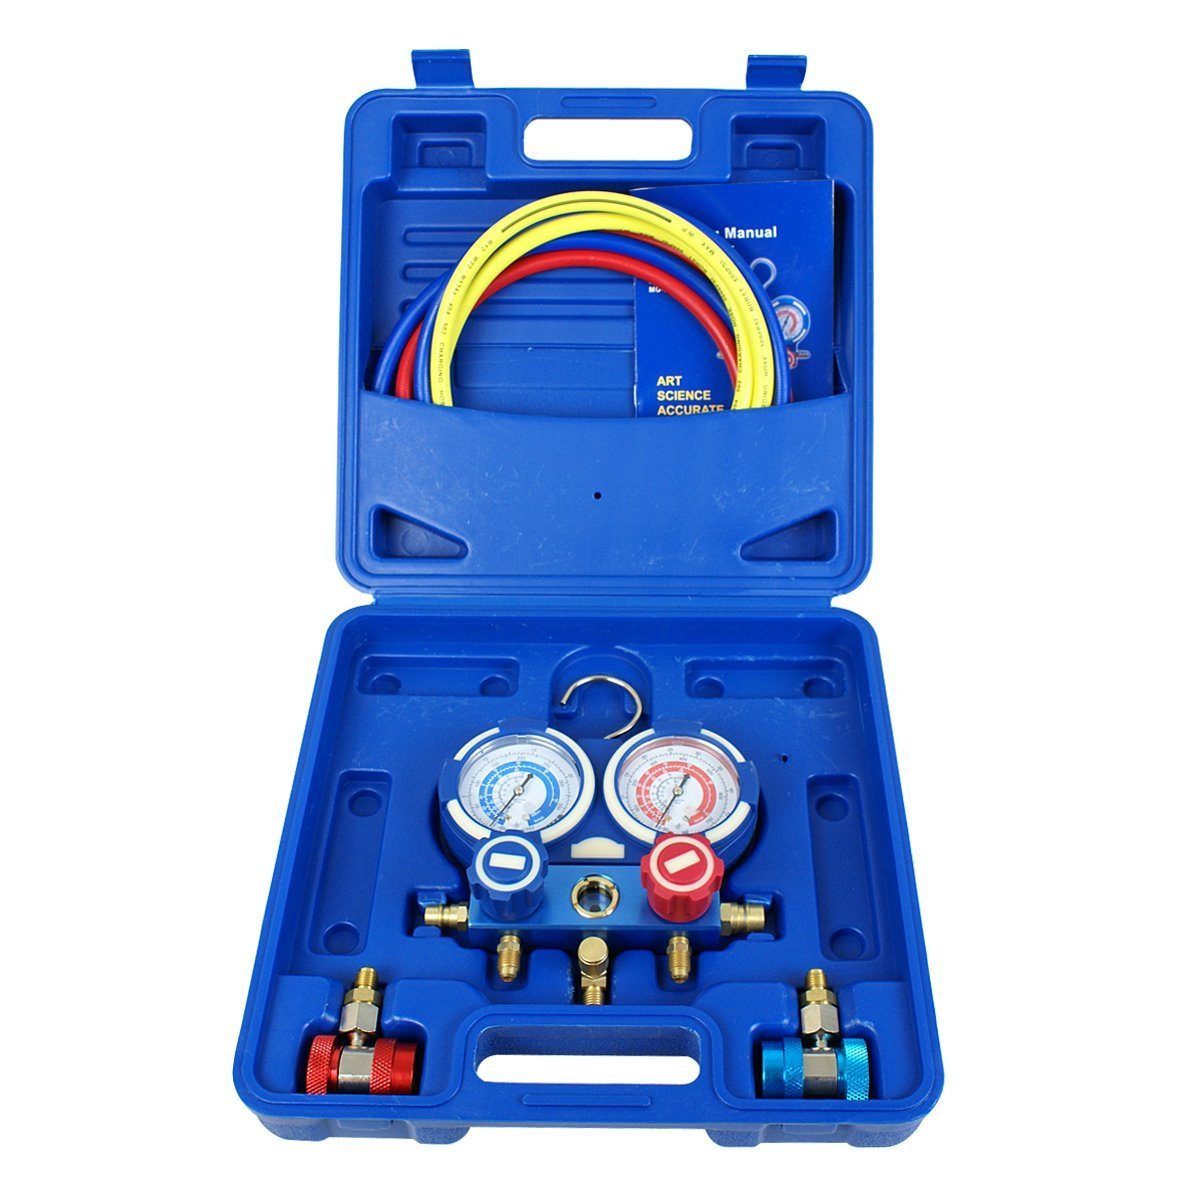 1//4 SAE Fittings ZENY Diagnostic A//C Manifold Gauge Set R134a Refrigeration Kit Brass Auto Serivice Kit 4FT w//Case